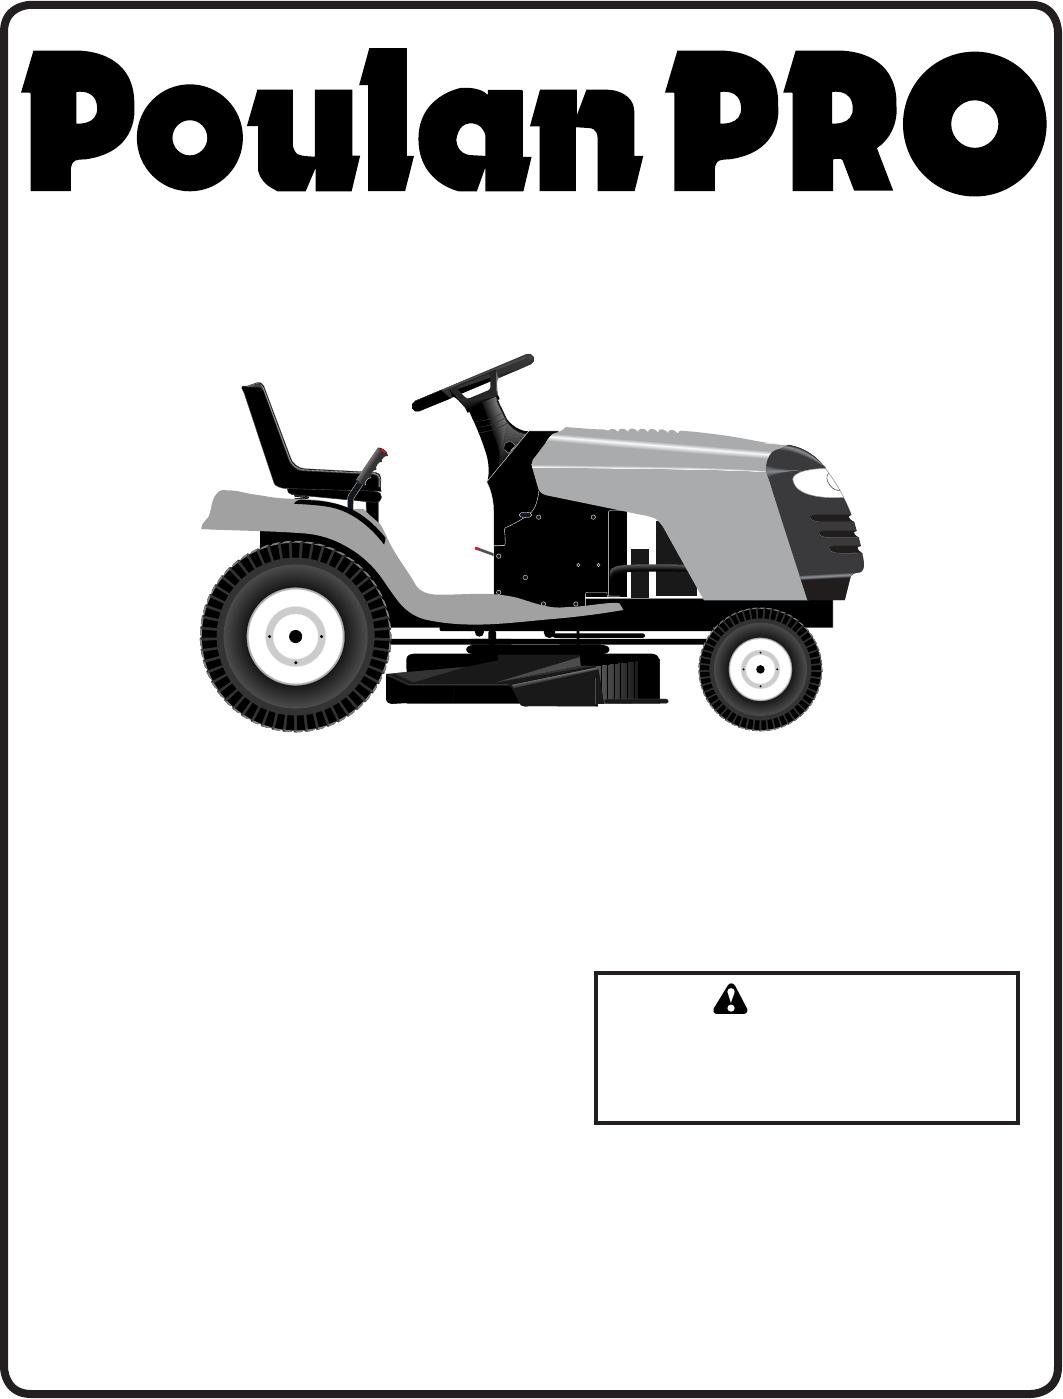 Poulan pb19546lt Lawn Mower User Manual